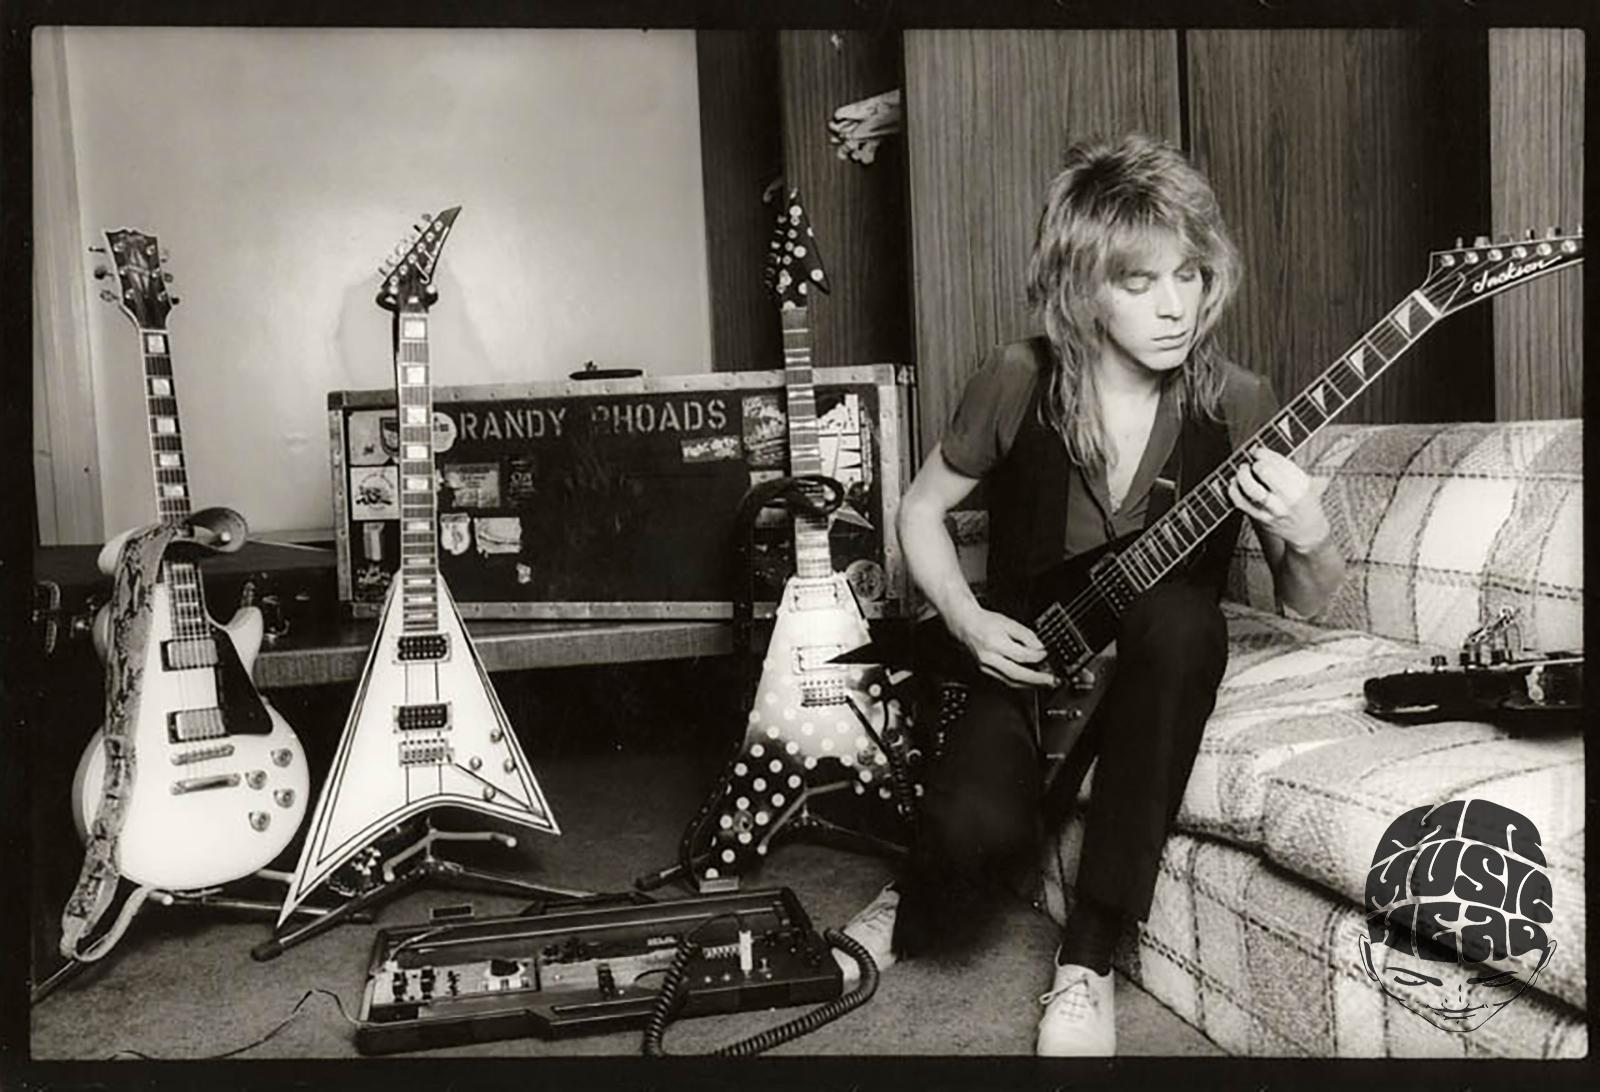 neil zlozower_Quiet Riot_Randy Rhoads_1981.jpg